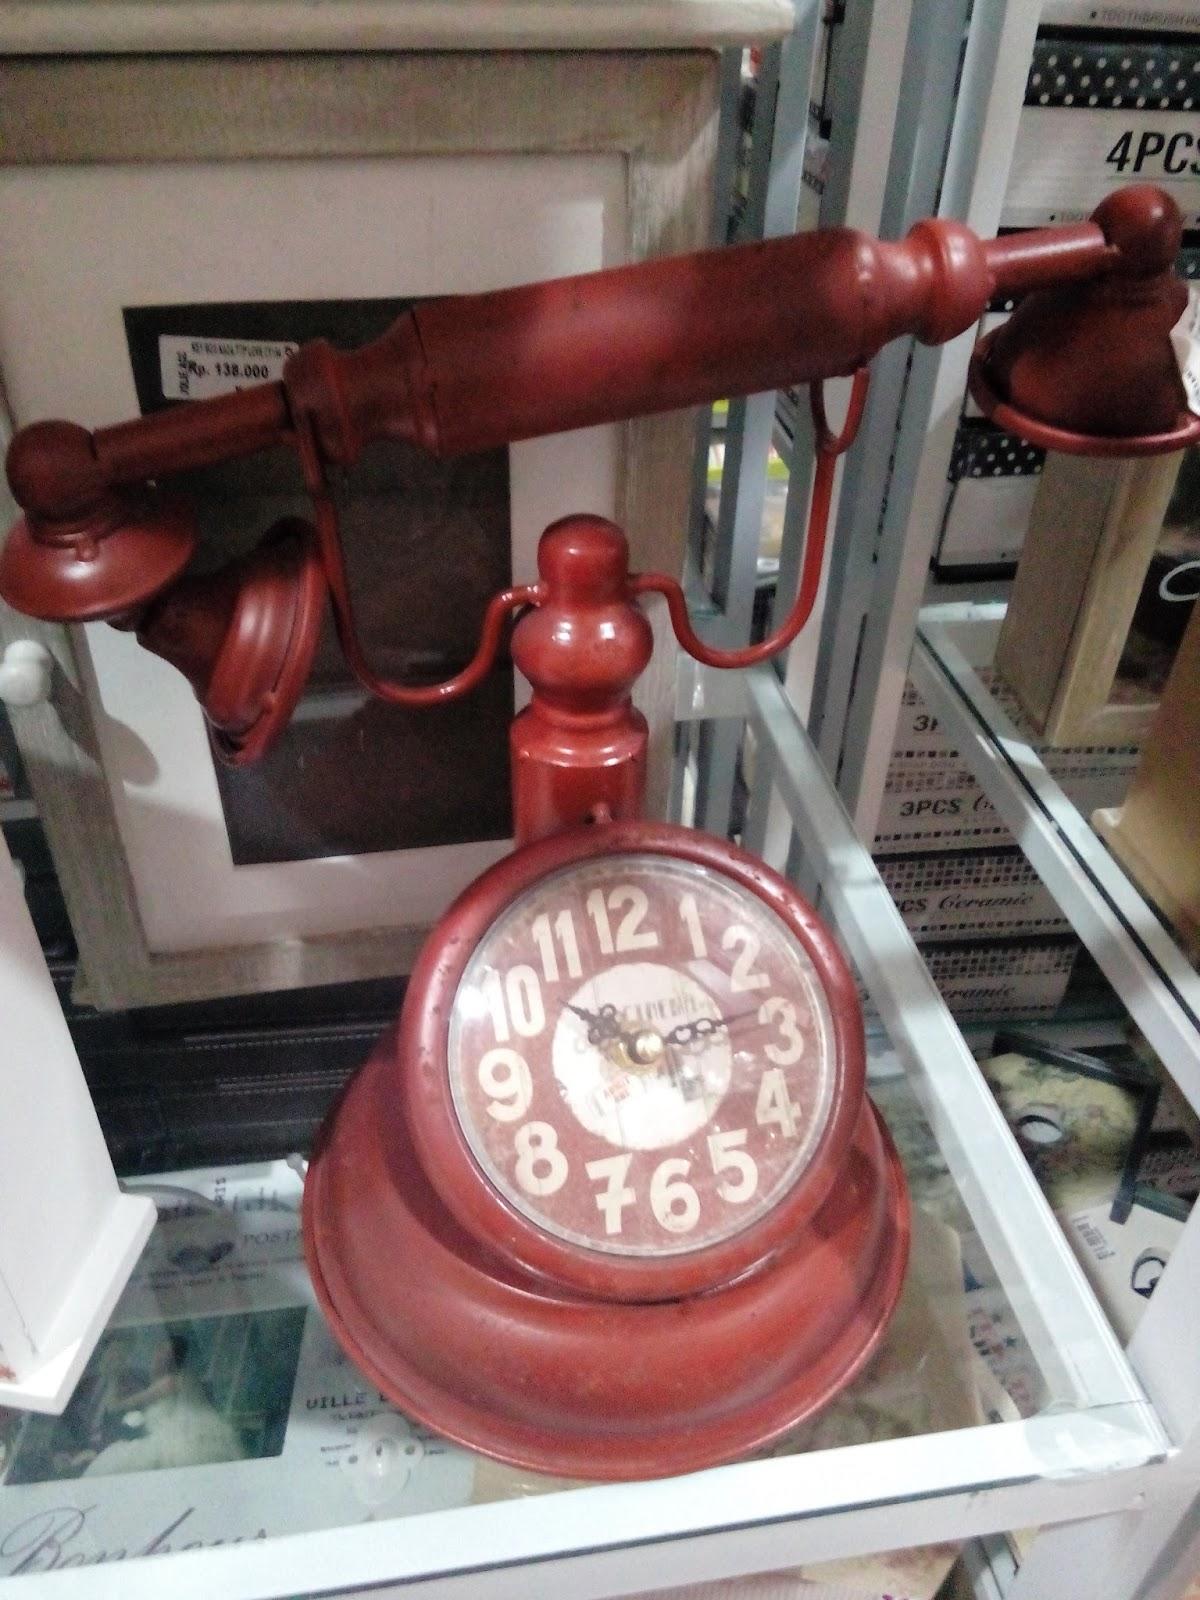 jam klasik vintage bentuk telepon jaman dulu Jolie Jogja Wirobrajan